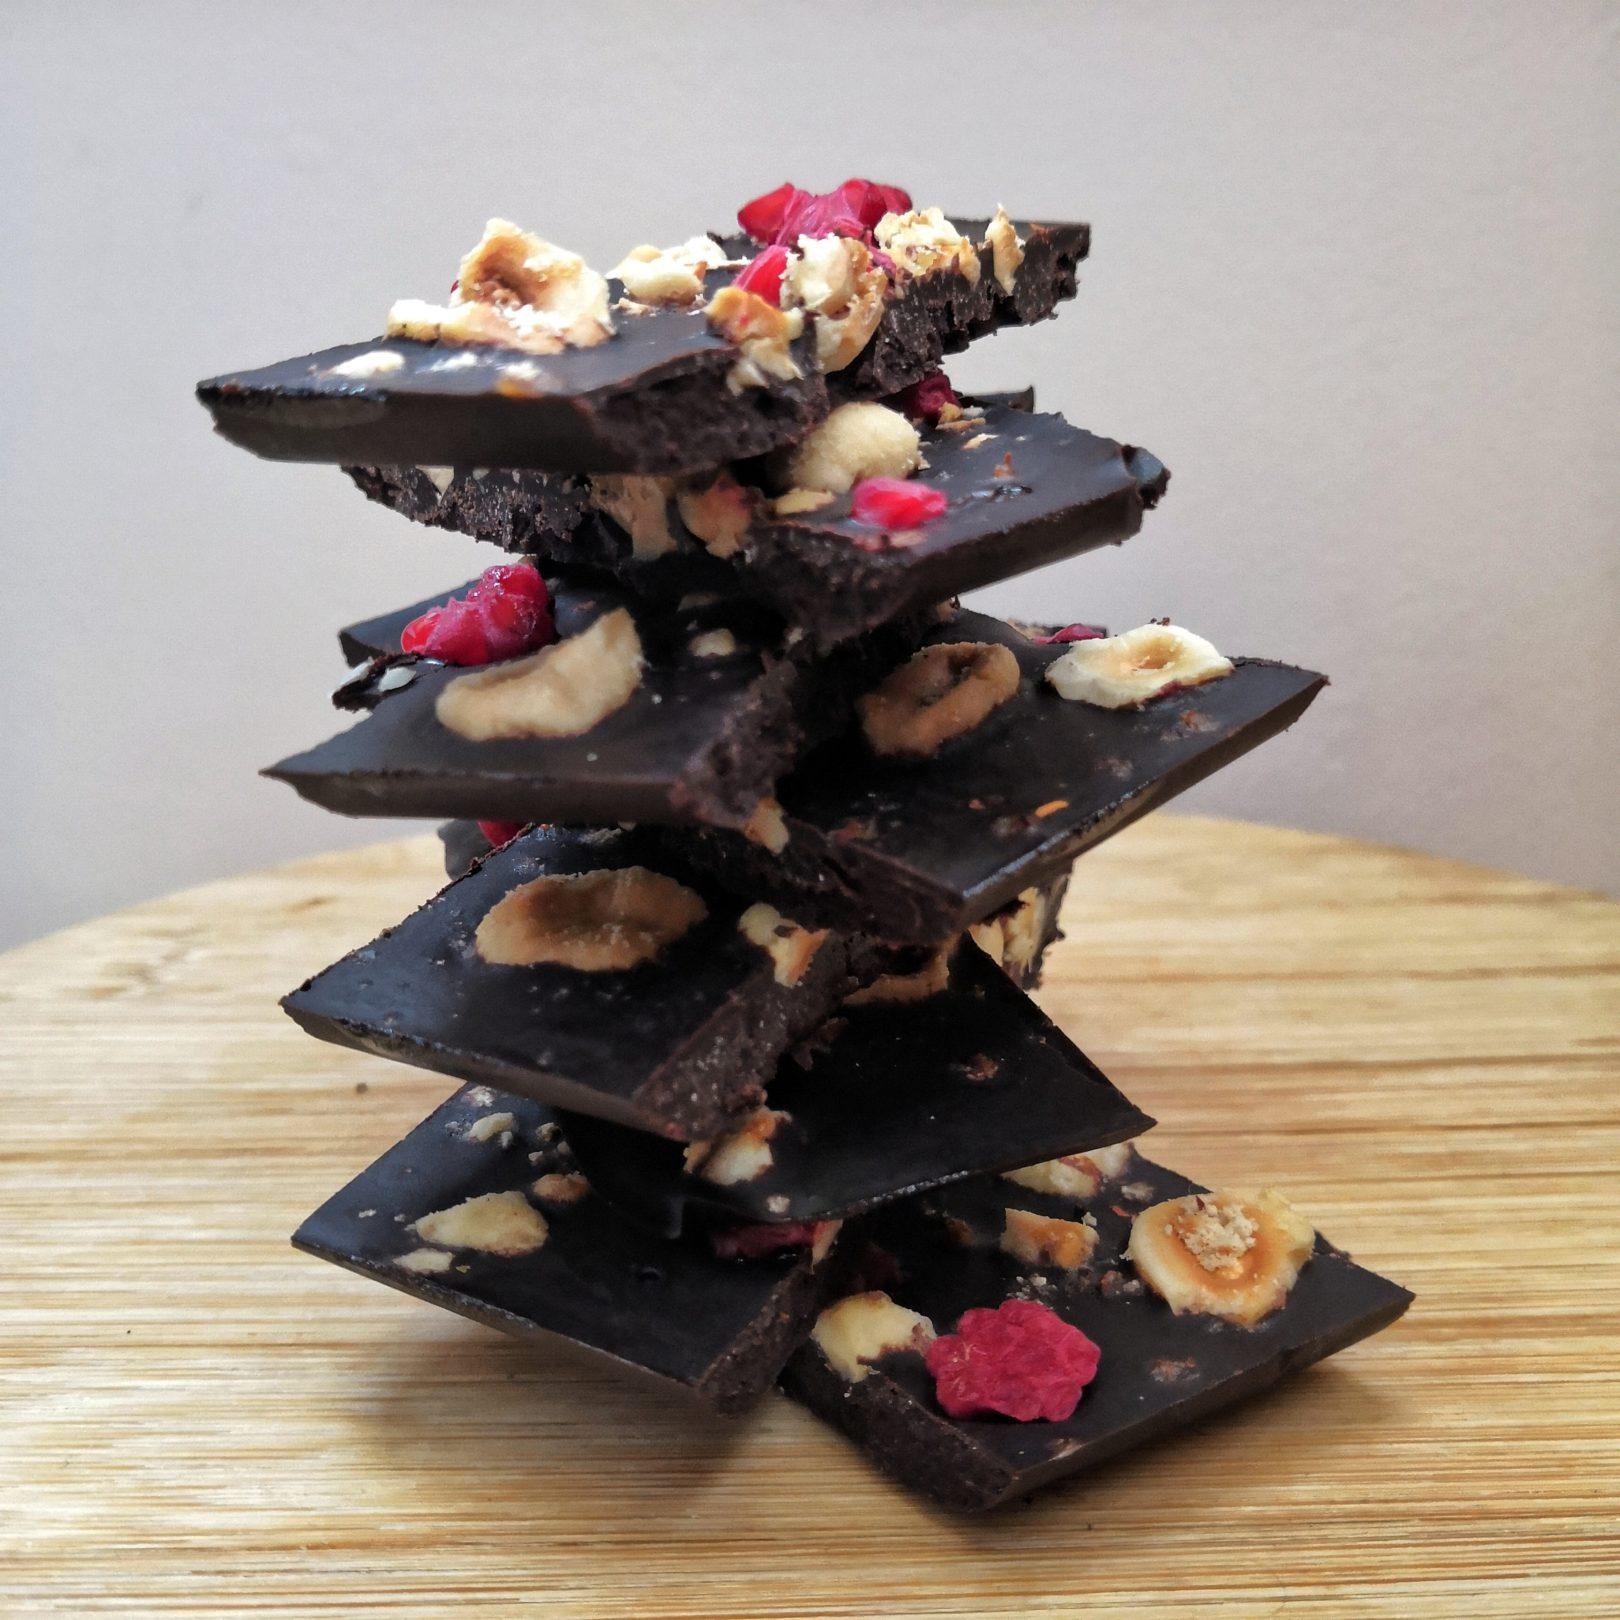 Homemade Keto Chocolate Bark – From Scratch!